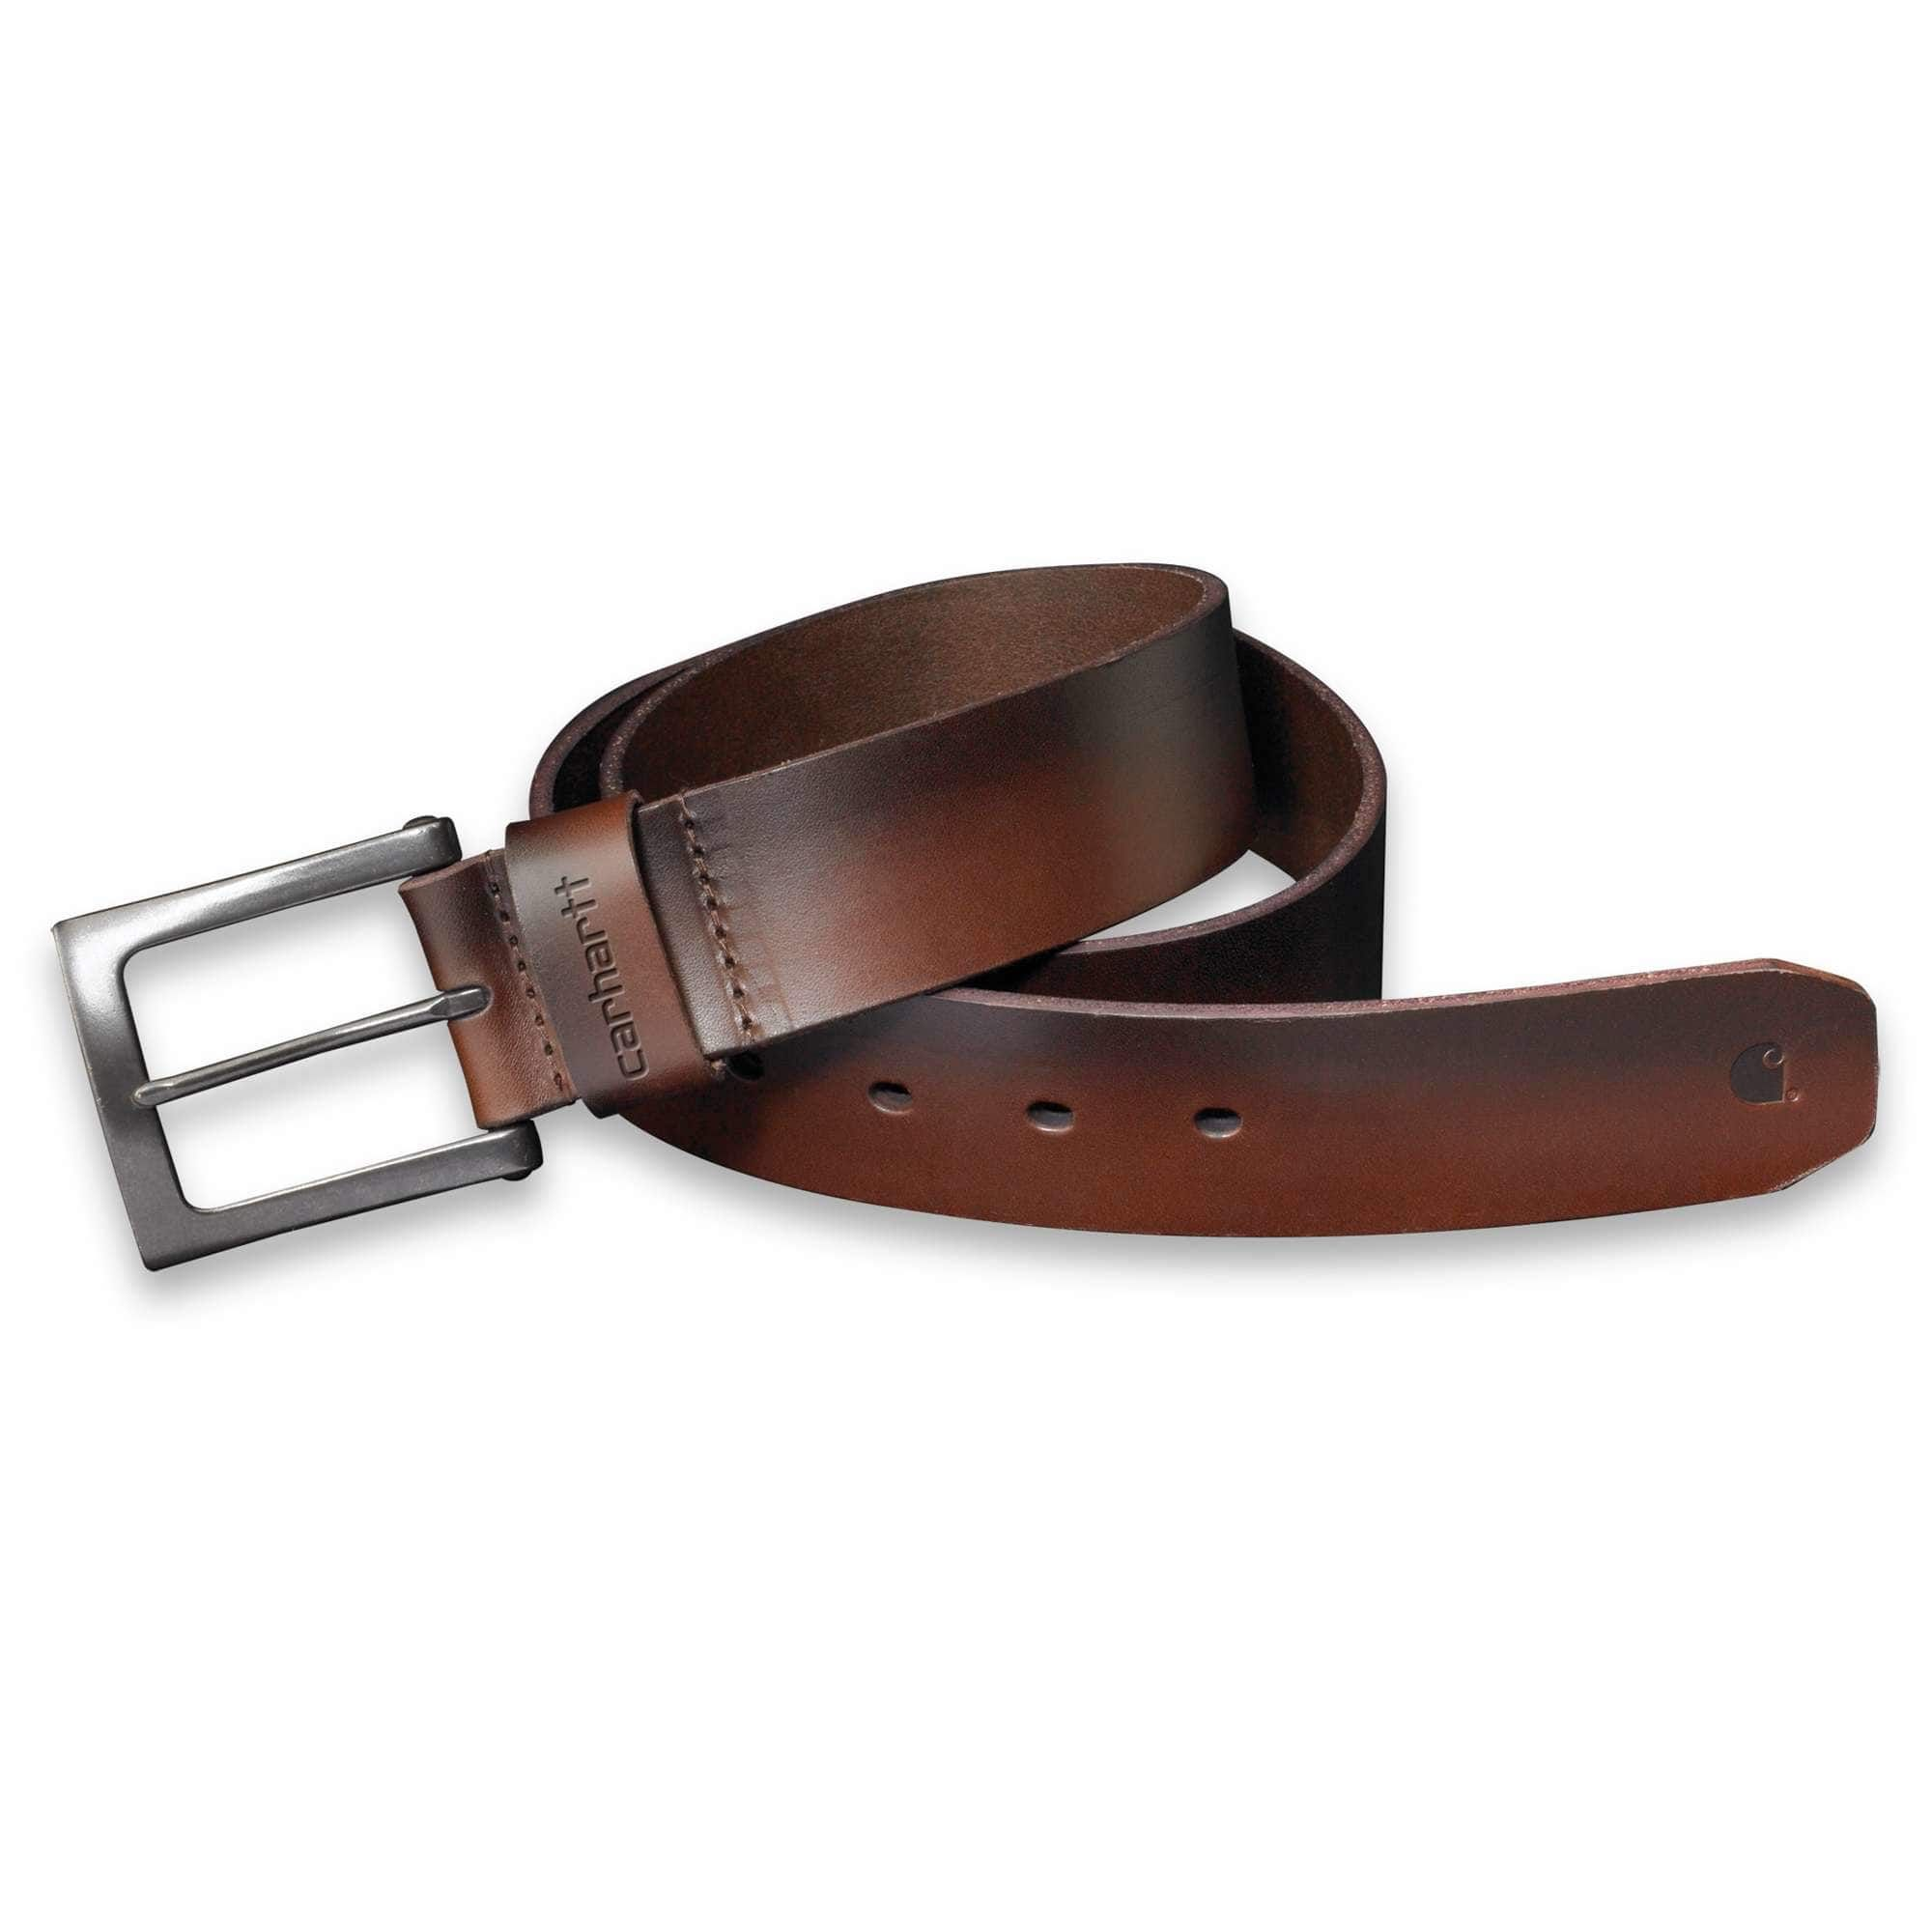 Anvil Belt   Carhartt, Wide leather belt, Leather